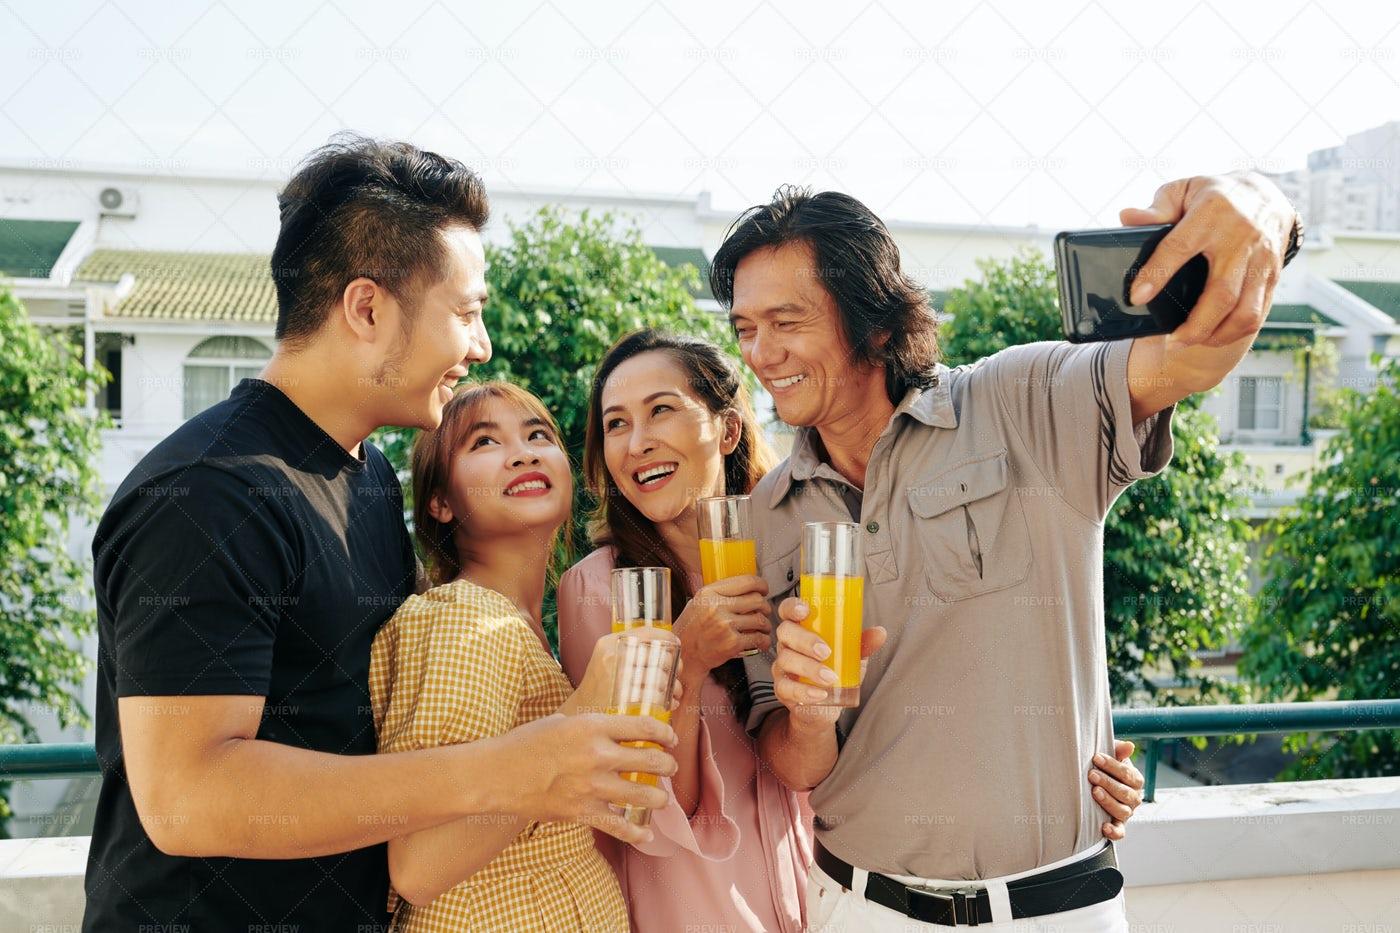 Happy Photographing Family: Stock Photos